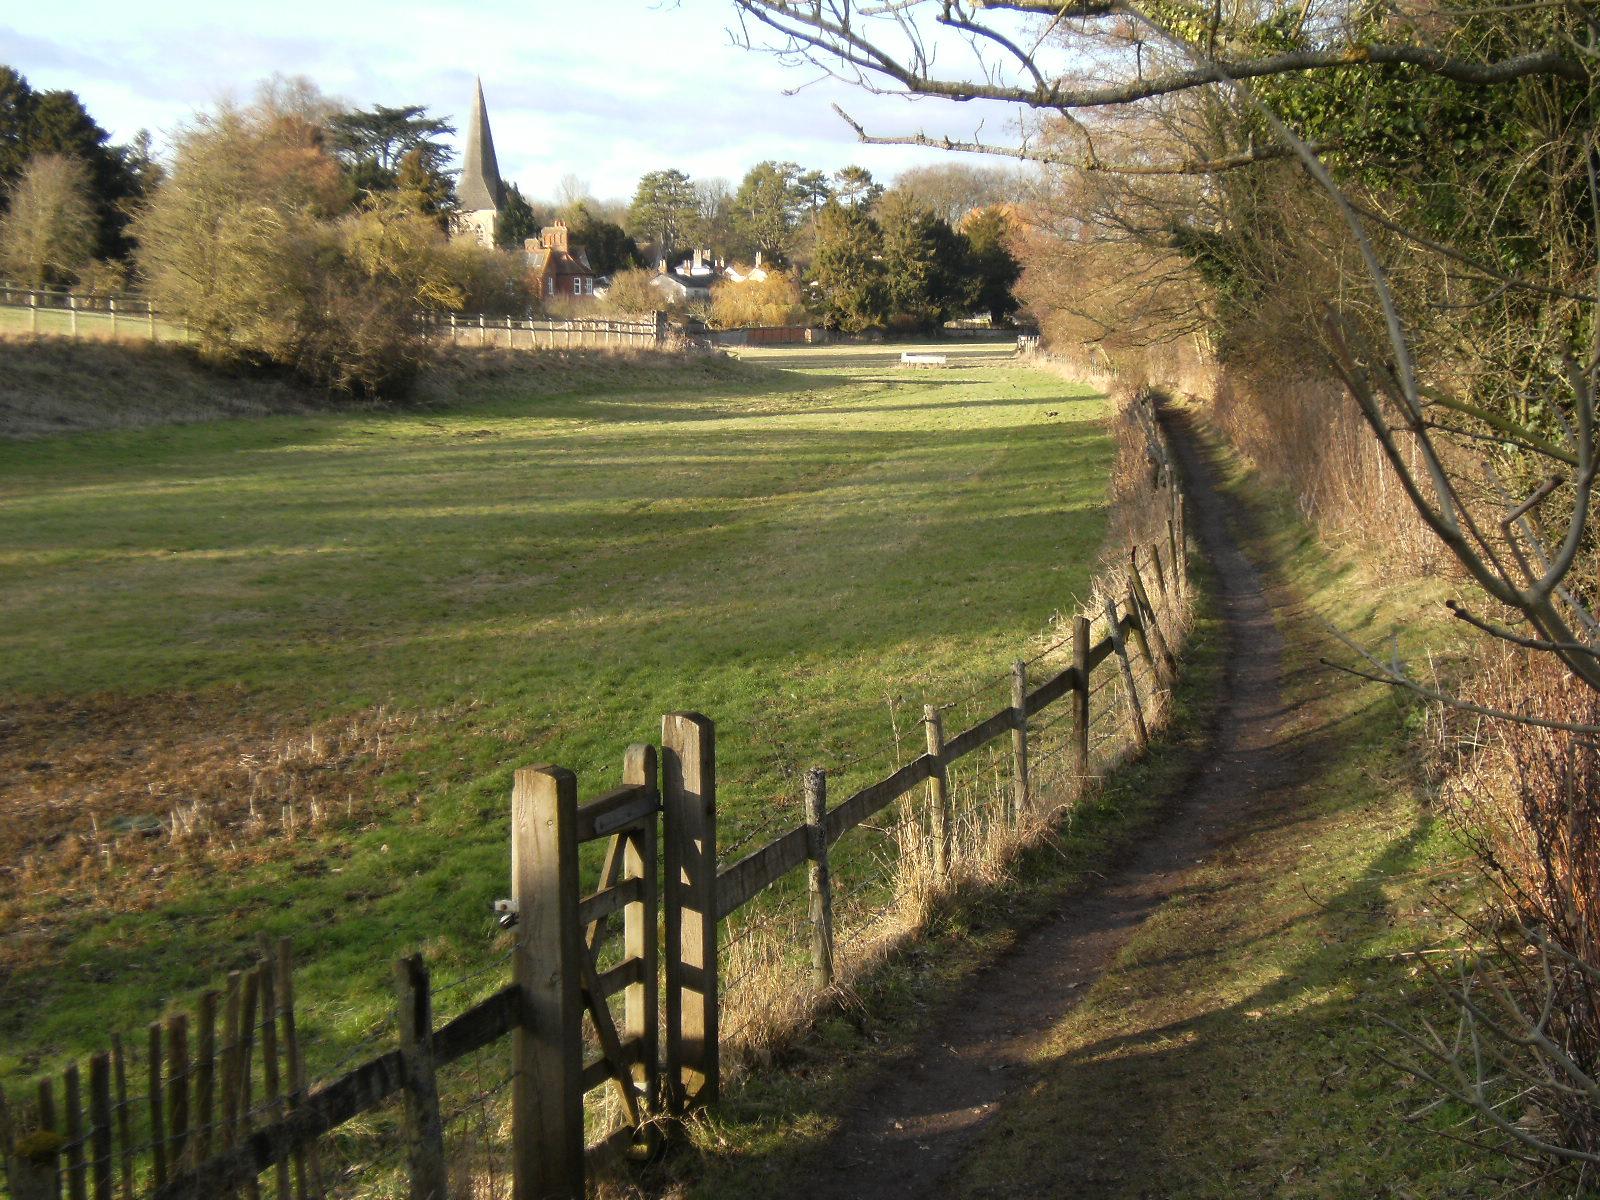 1002110086 Footpath to All Hallows Church, Whitchurch